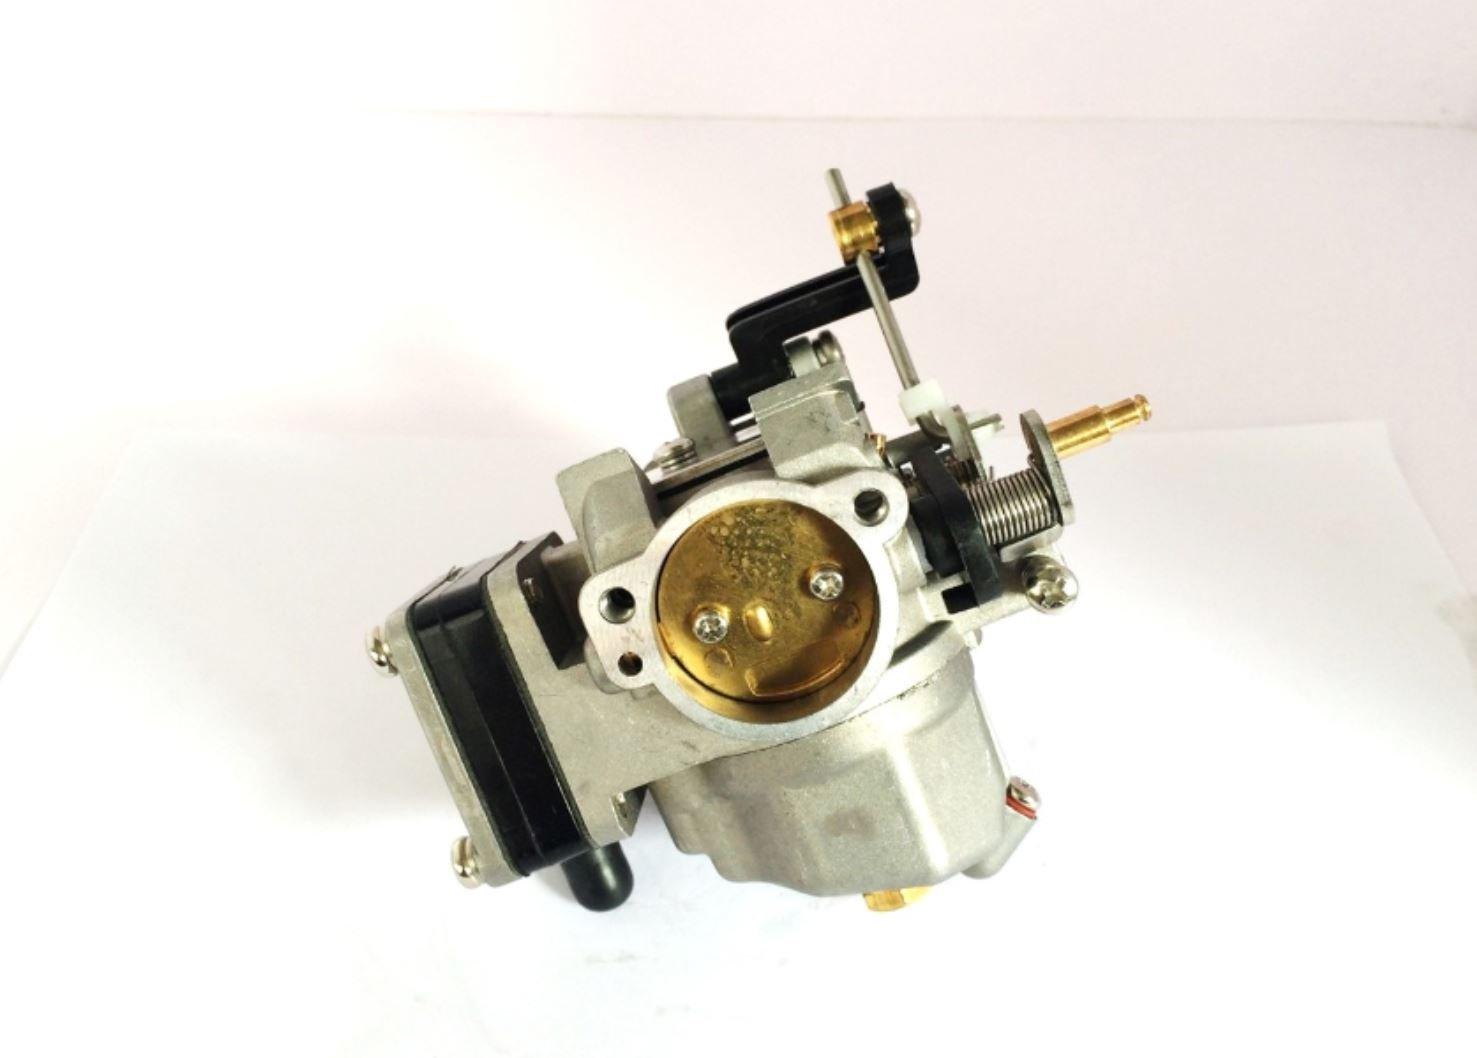 YAMASCO 684– 14301– 01 684– 14301– 04 684– 14301– 05 06 07 08 Vergaser Carb ASSY fü r Yamaha Auß enborder 9,9, 13,5, 15HP 2 Takt Motor